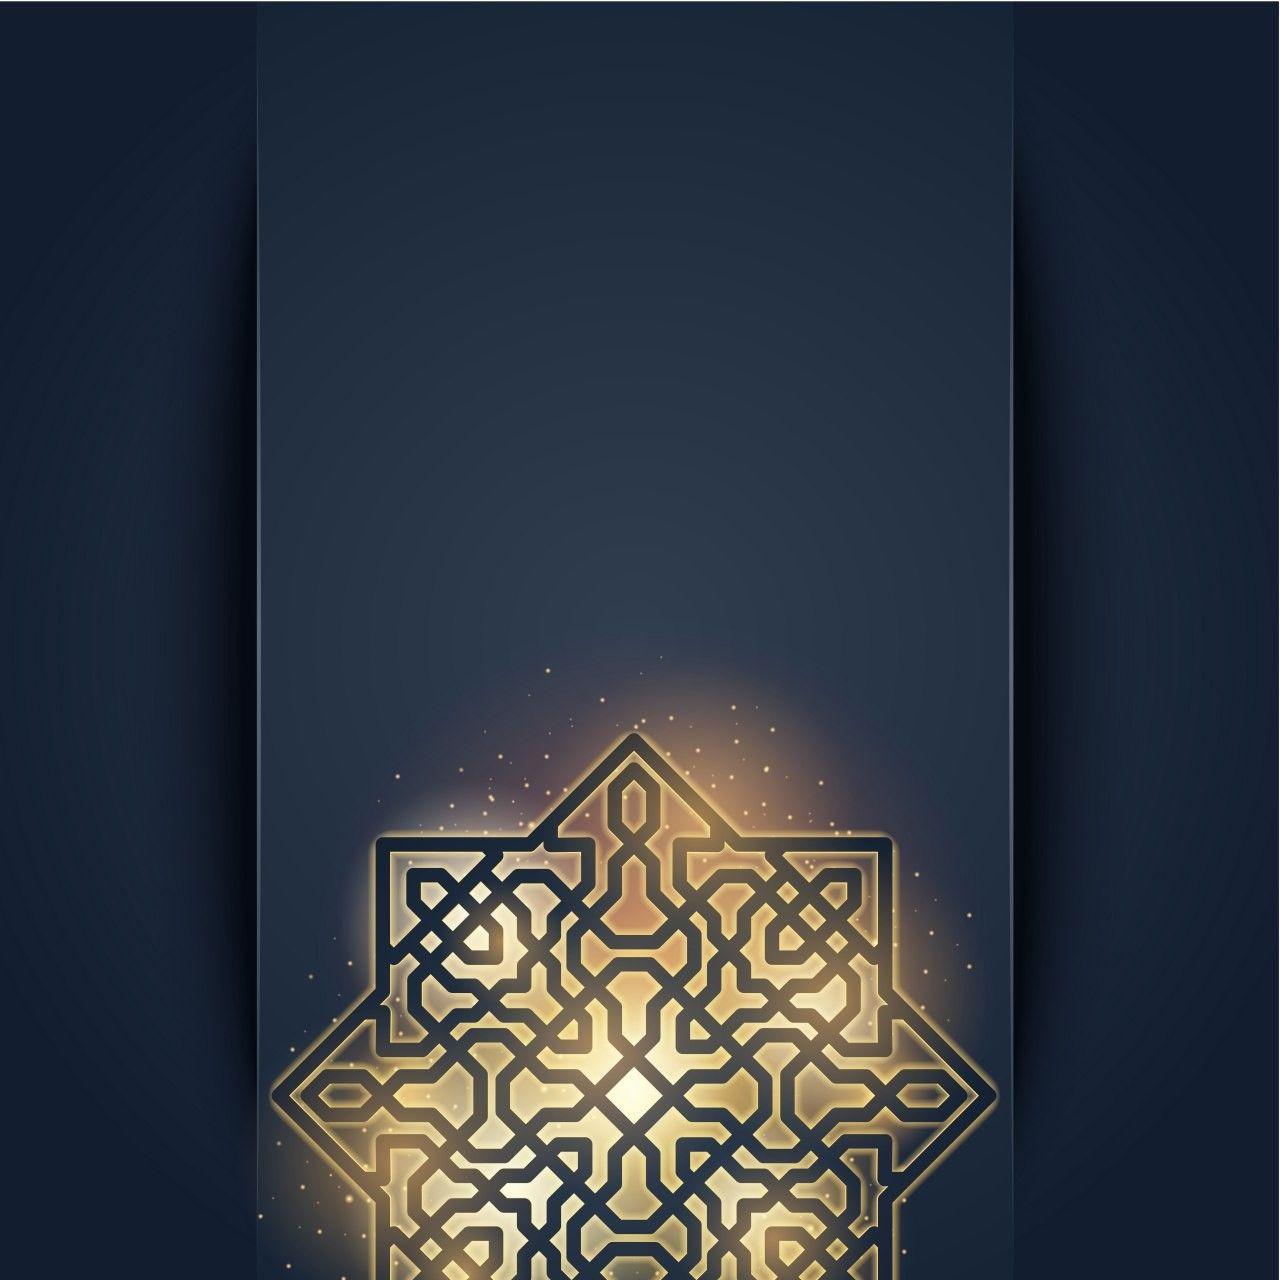 Ssssppp Islamic Art Pattern Islamic Design Islamic Artwork